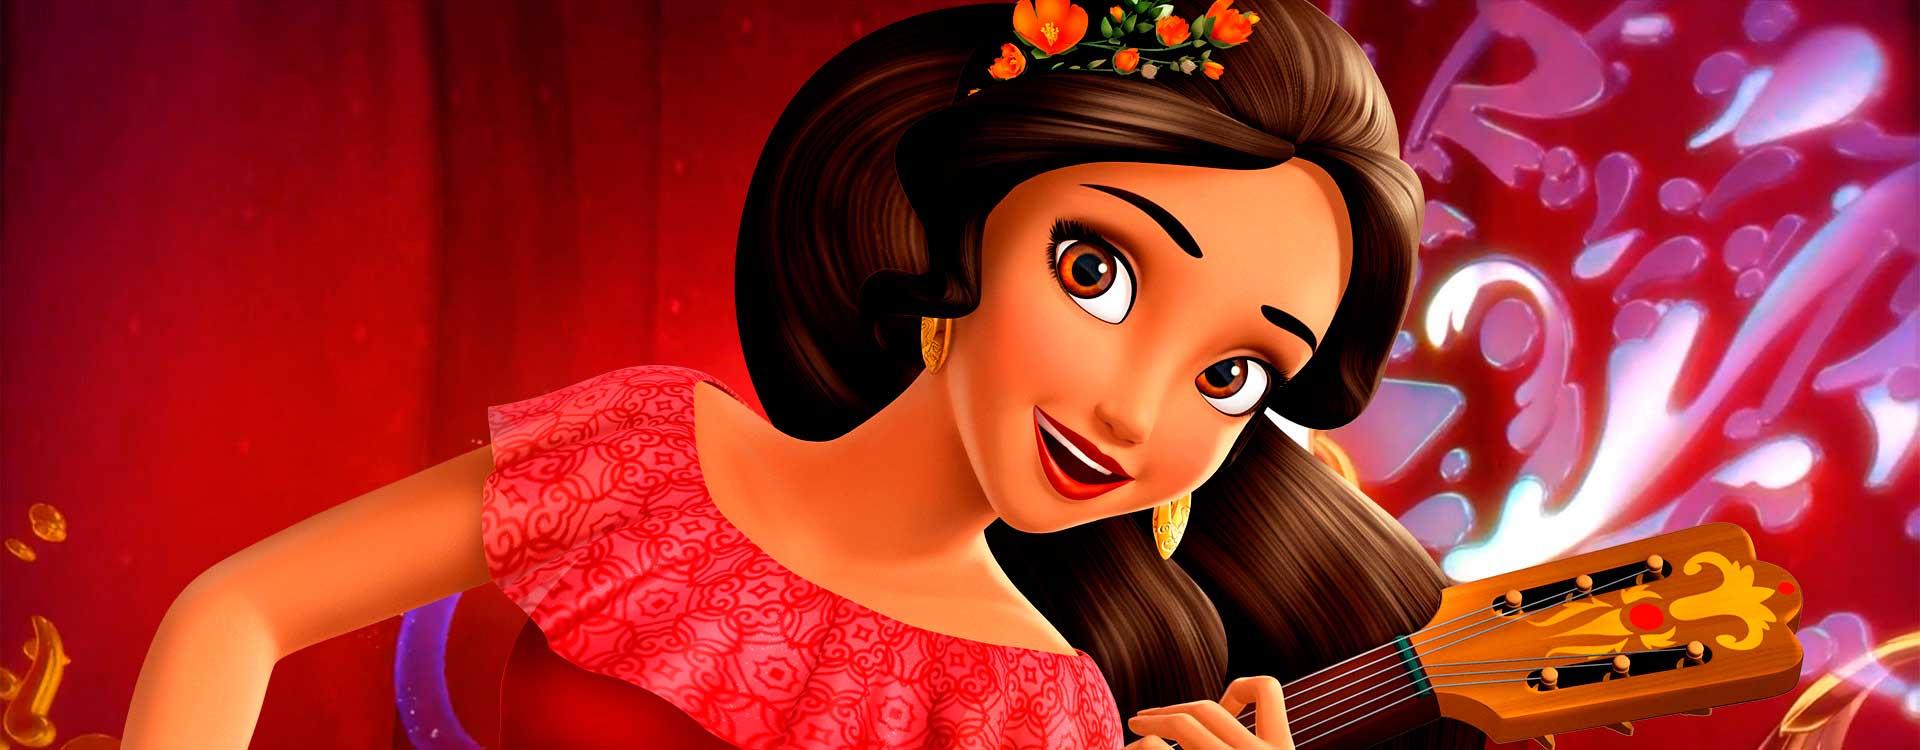 Elena de Avalor princesa de disney - Las princesas de disney